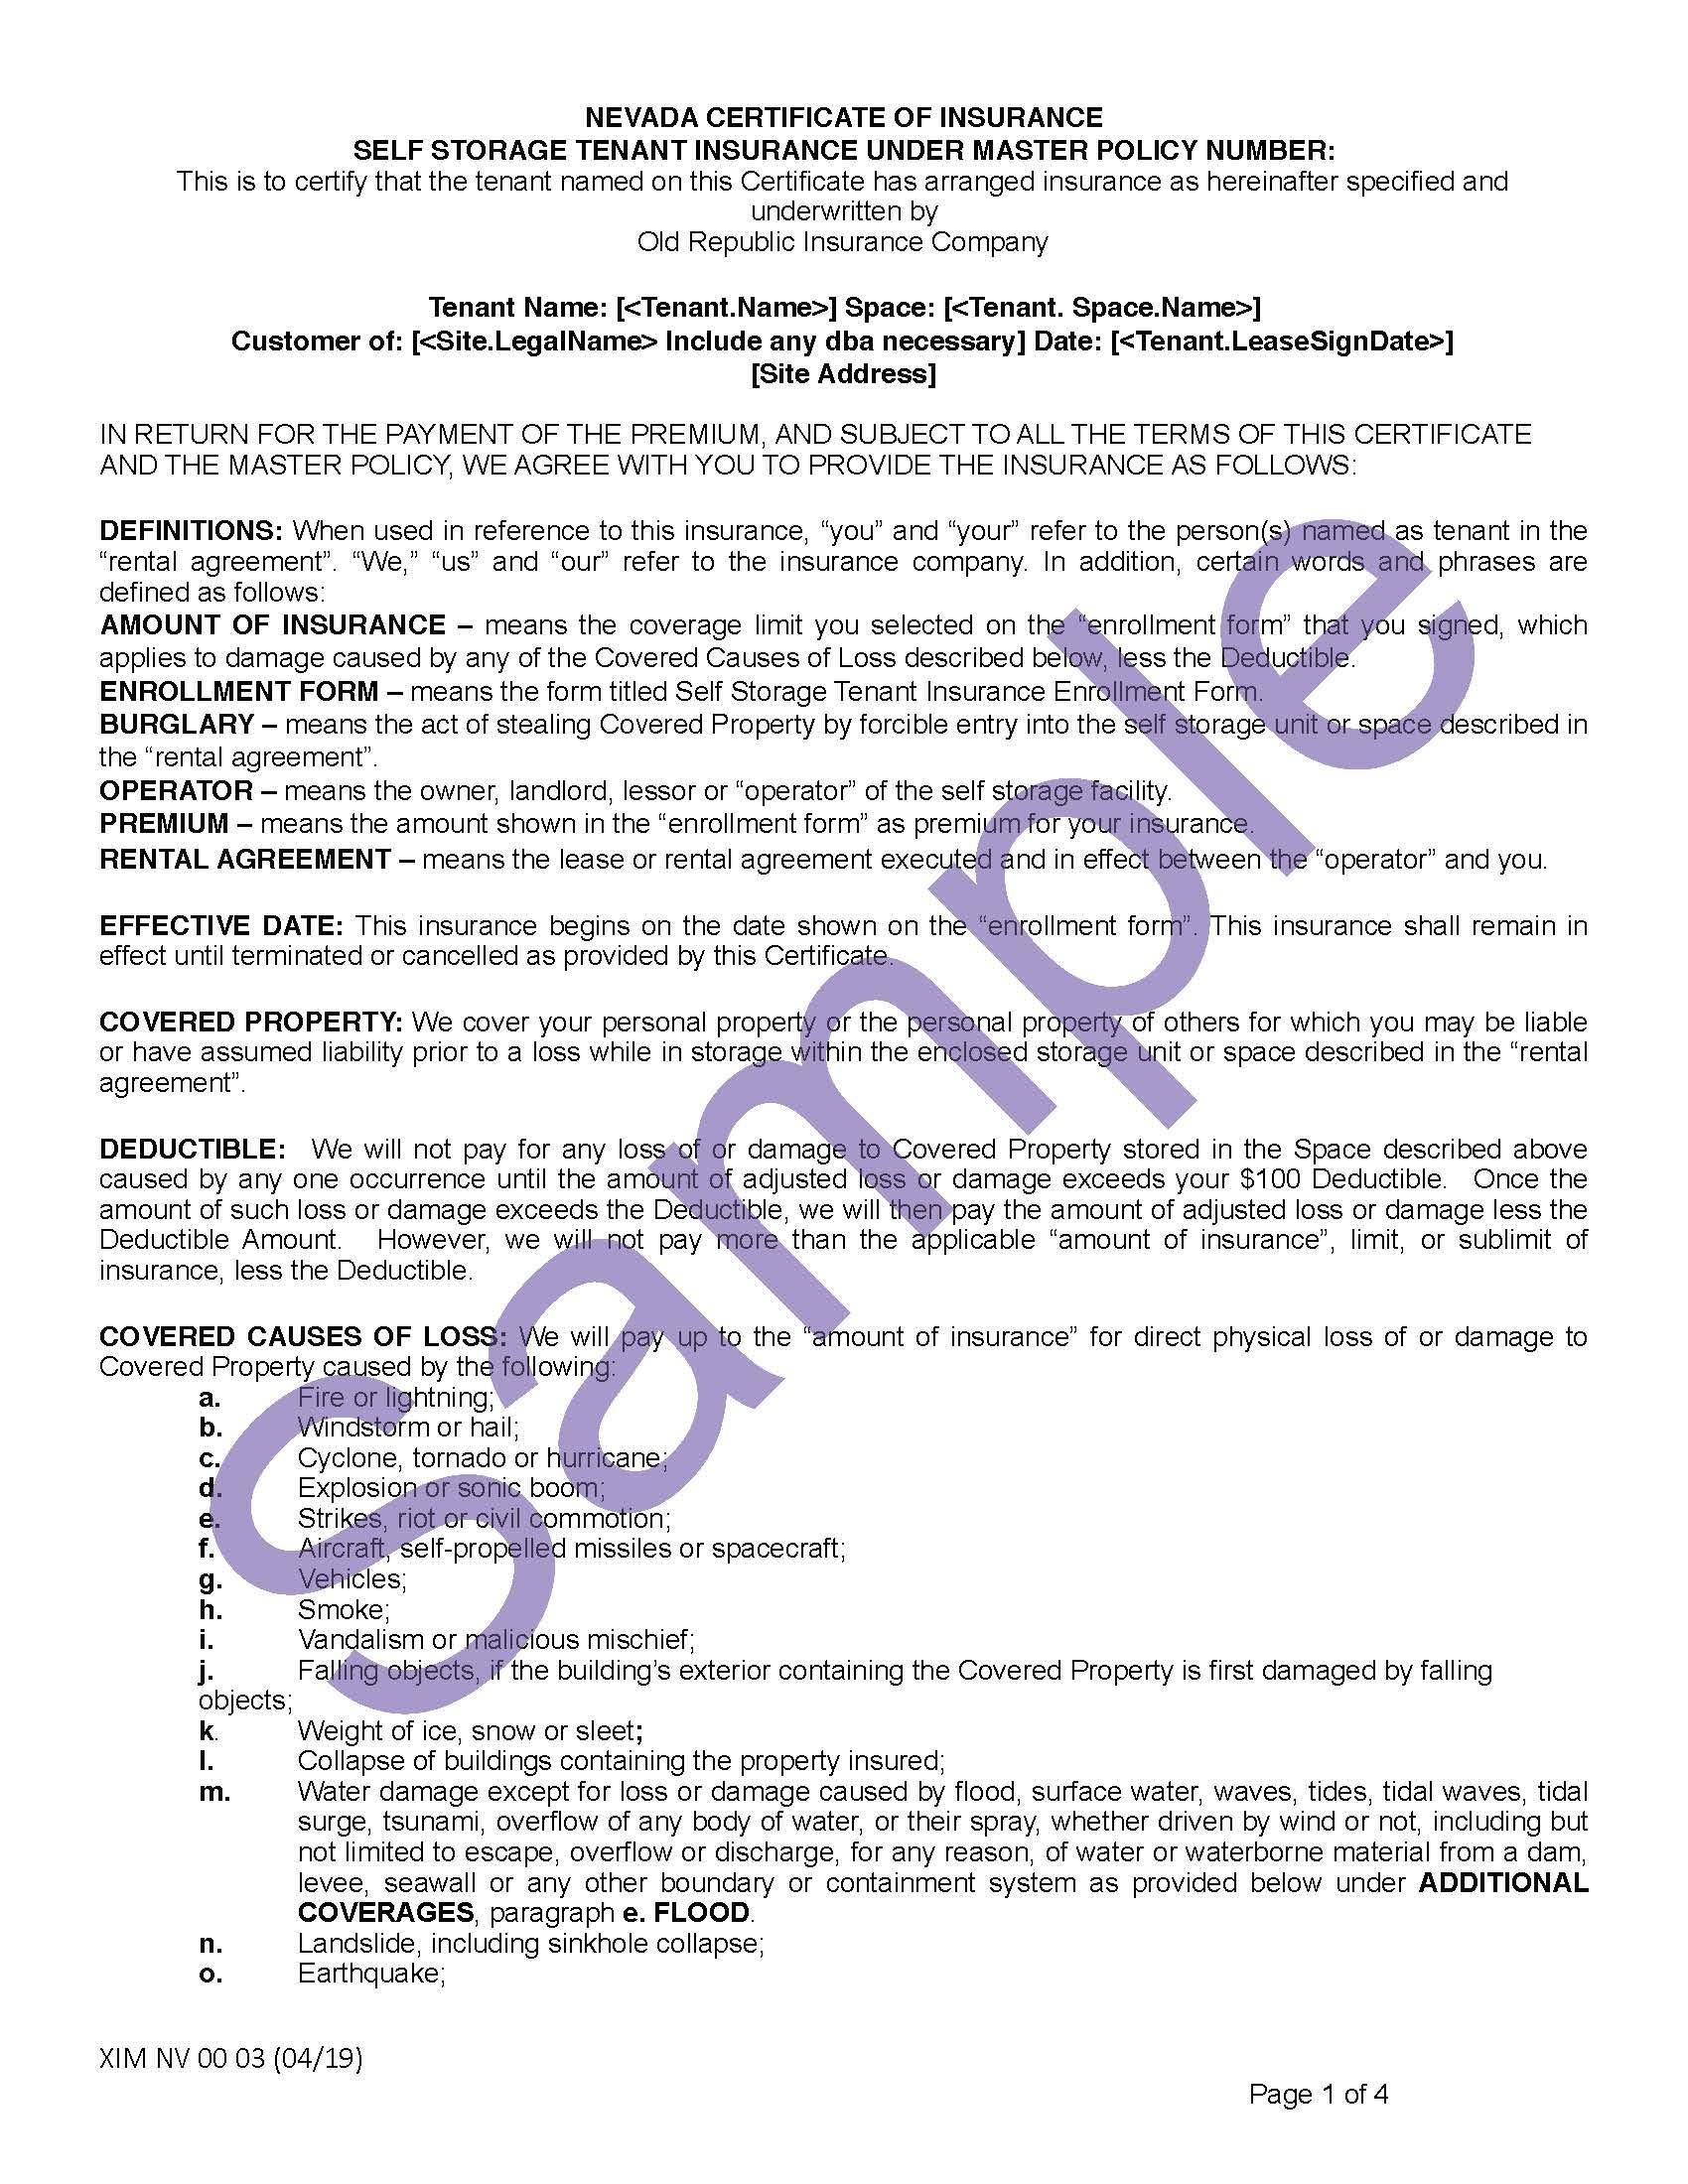 XIM NV 00 03 04 19 Nevada Certificate of InsuranceSample_Page_1.jpg